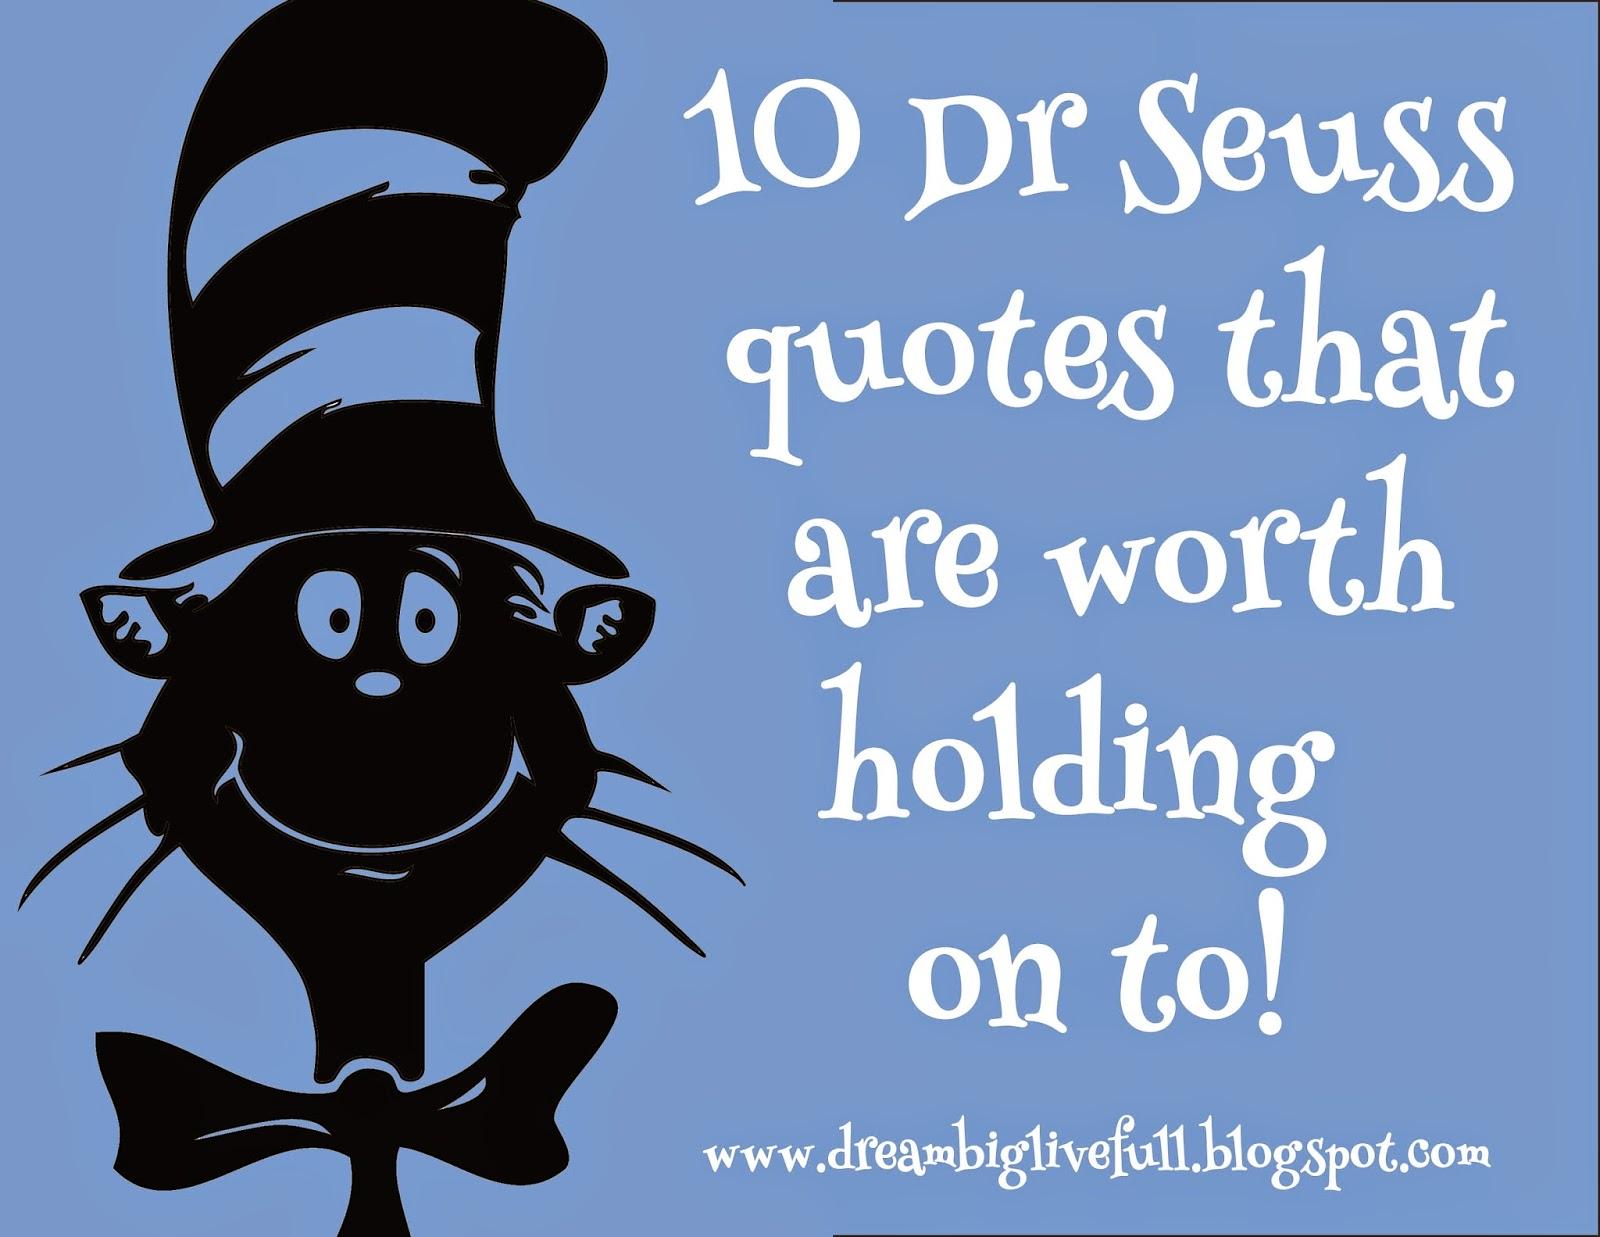 Dr Seuss Quotes About Cats. QuotesGram